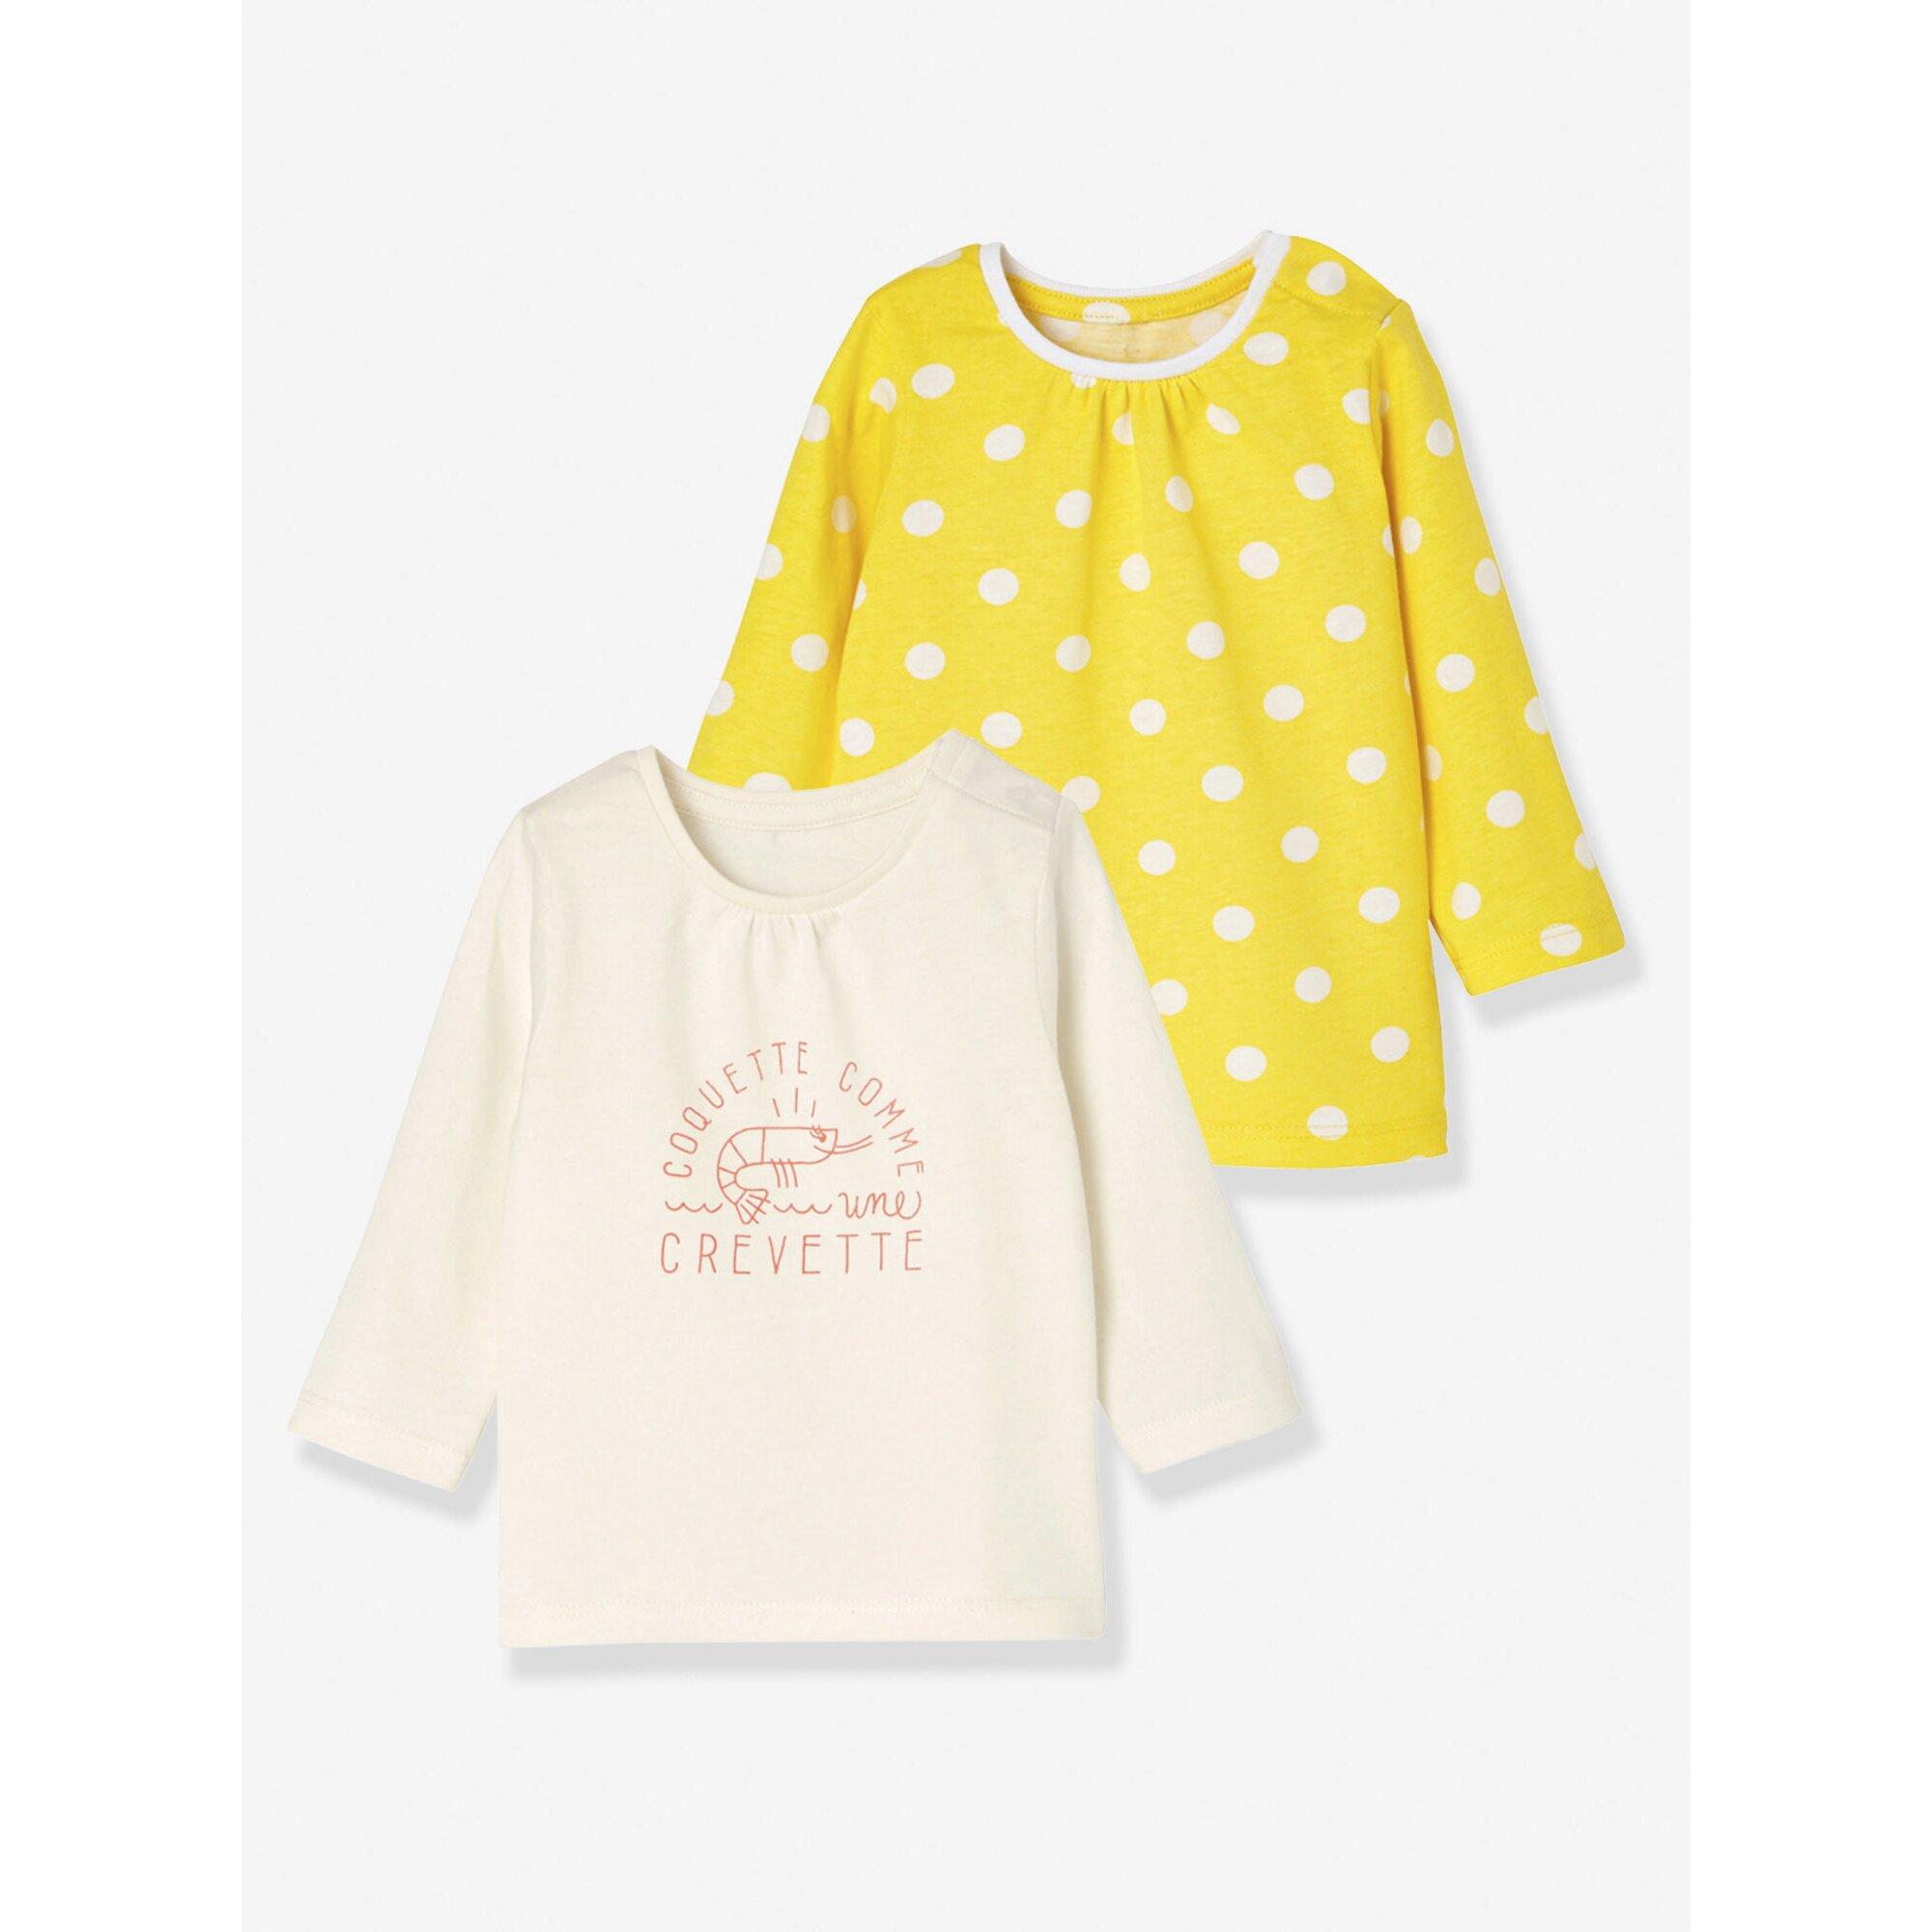 vertbaudet-2er-pack-baby-madchen-shirts-langarm